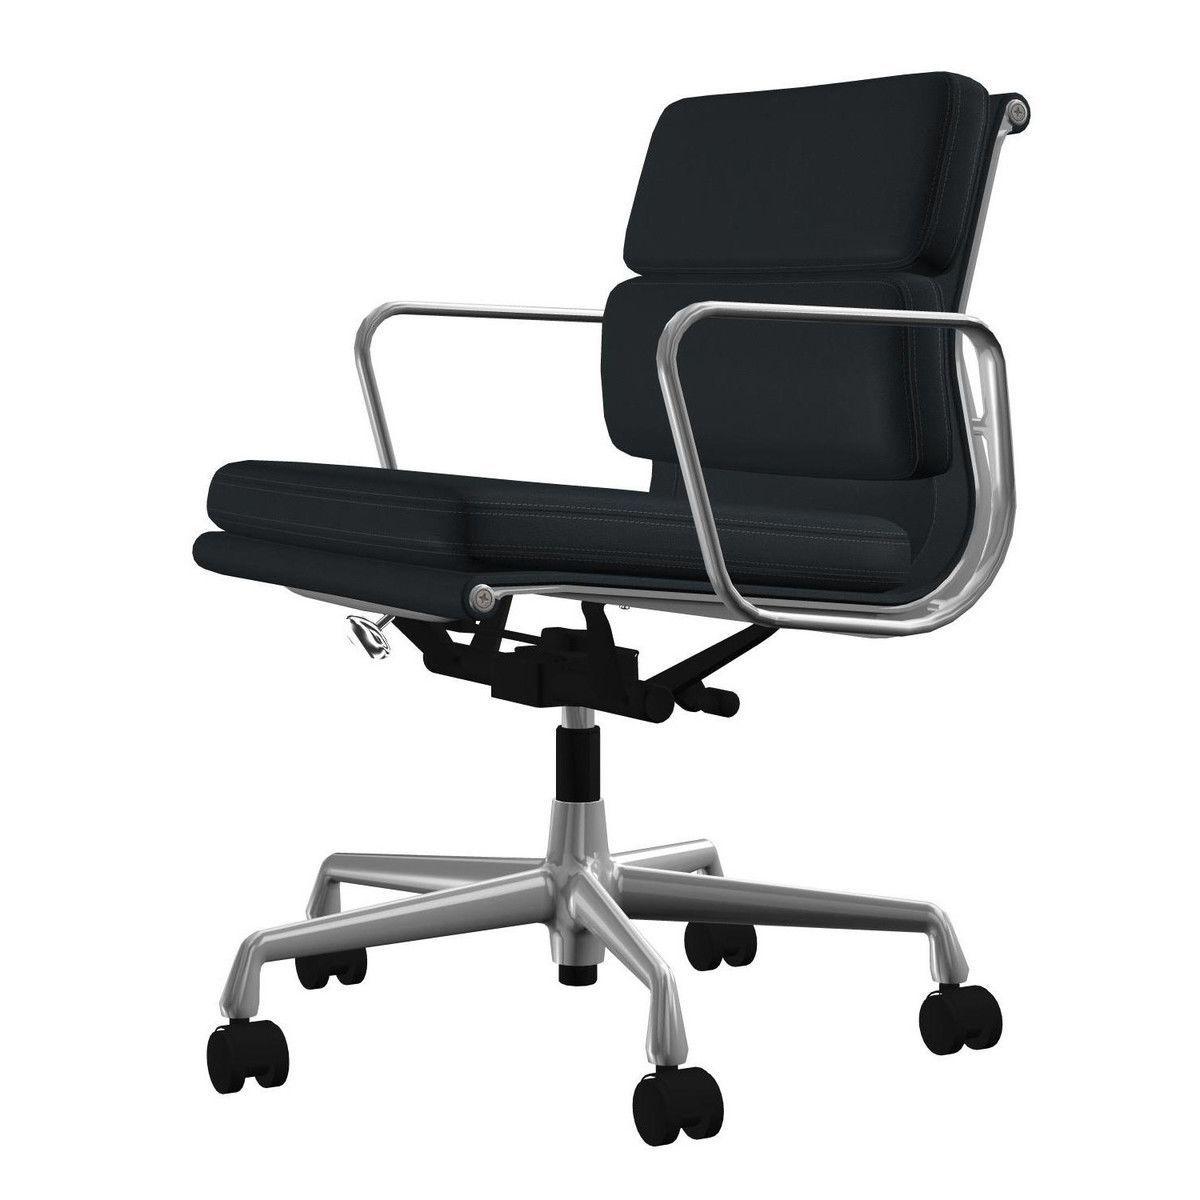 Bürostuhl eames  EA 217 Soft Pad Eames Alu Chair Bürostuhl | Vitra | AmbienteDirect.com